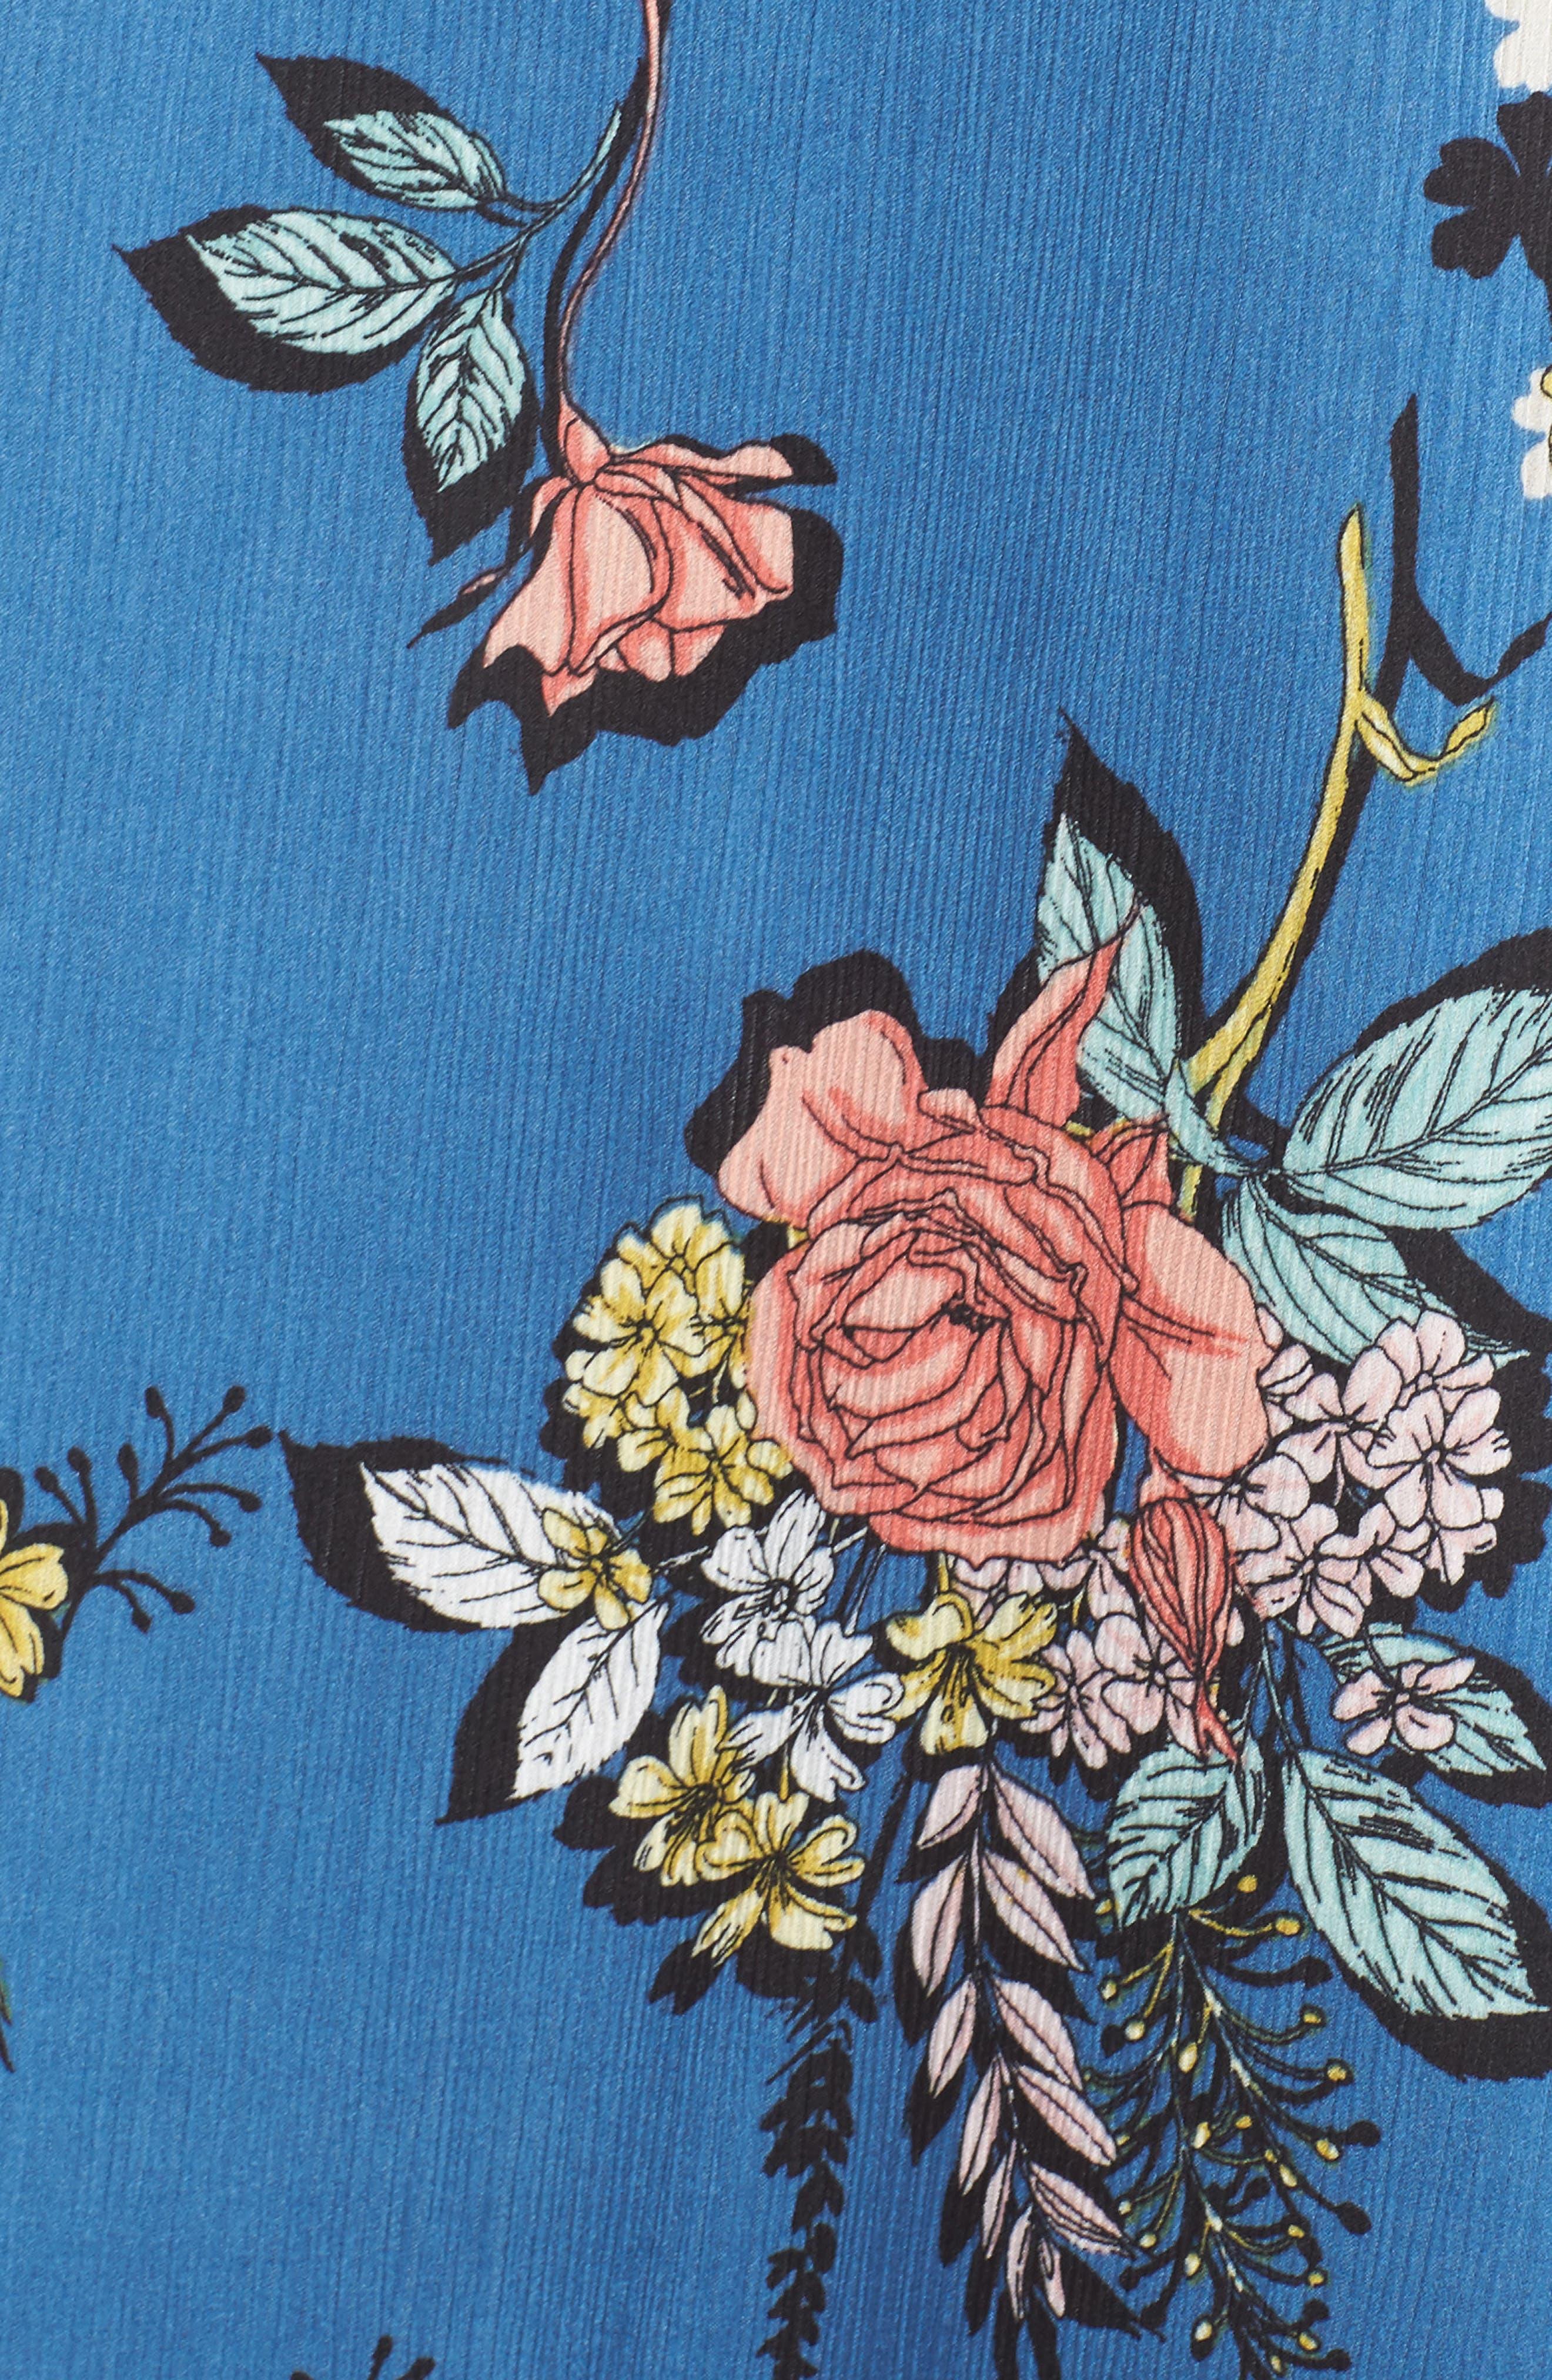 Off the Shoulder Ruffle Dress,                             Alternate thumbnail 5, color,                             Charcoal Flower Blue